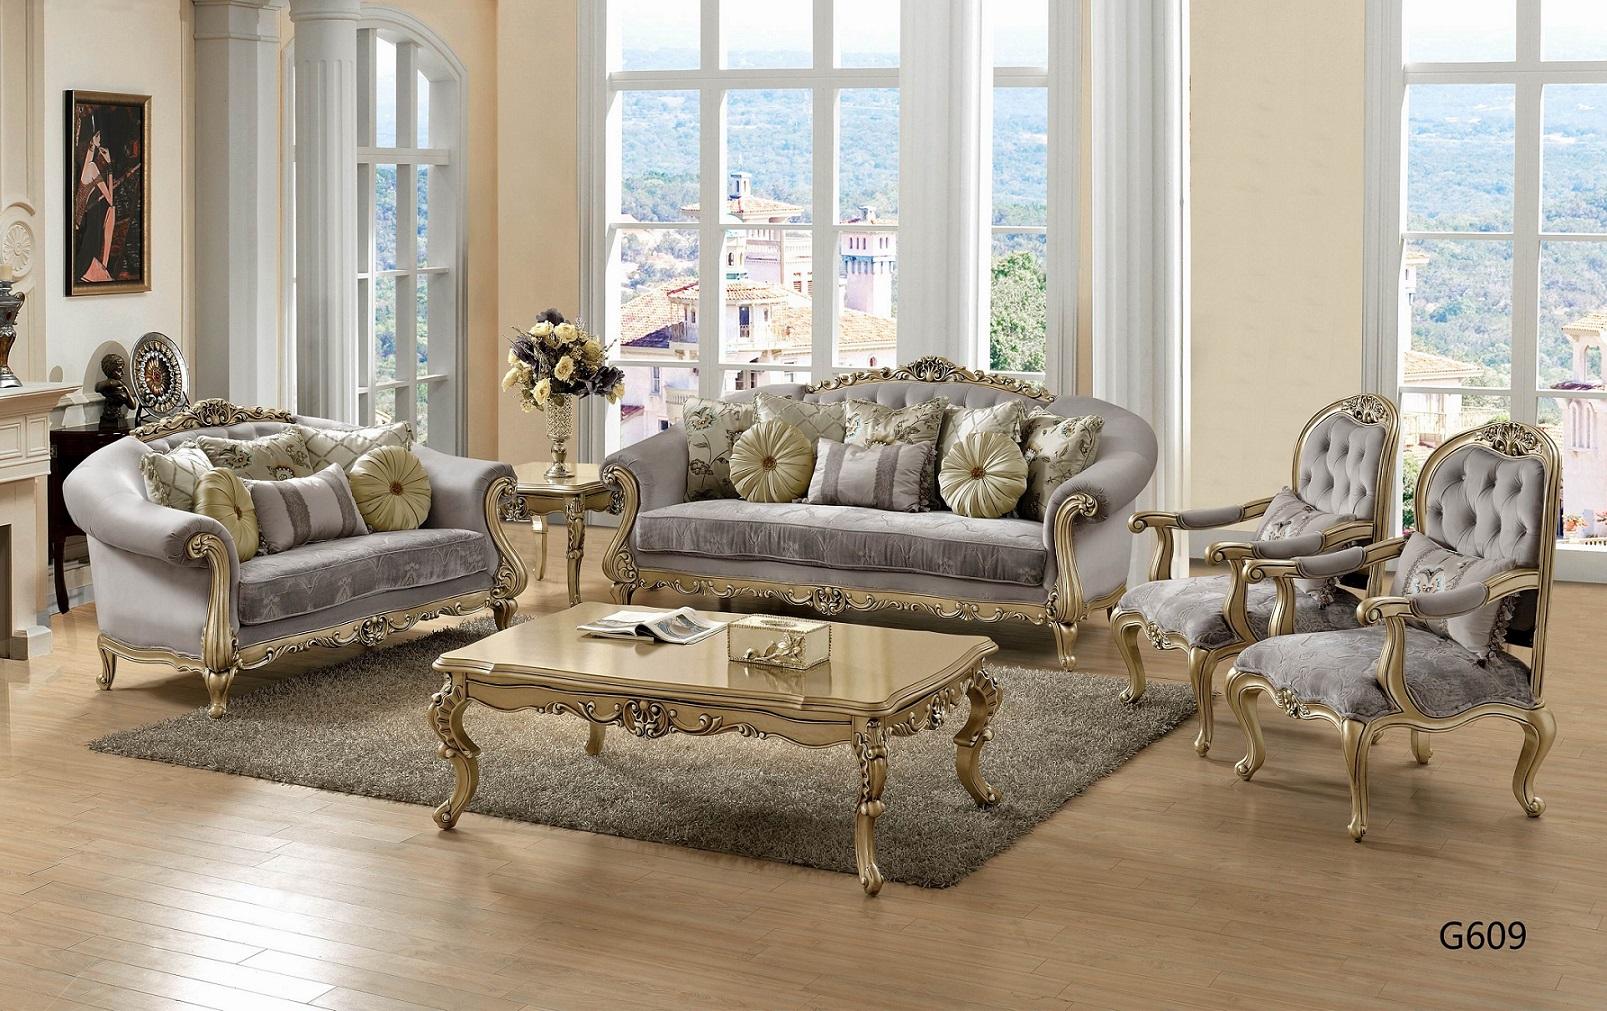 Victorian Living Room G-609